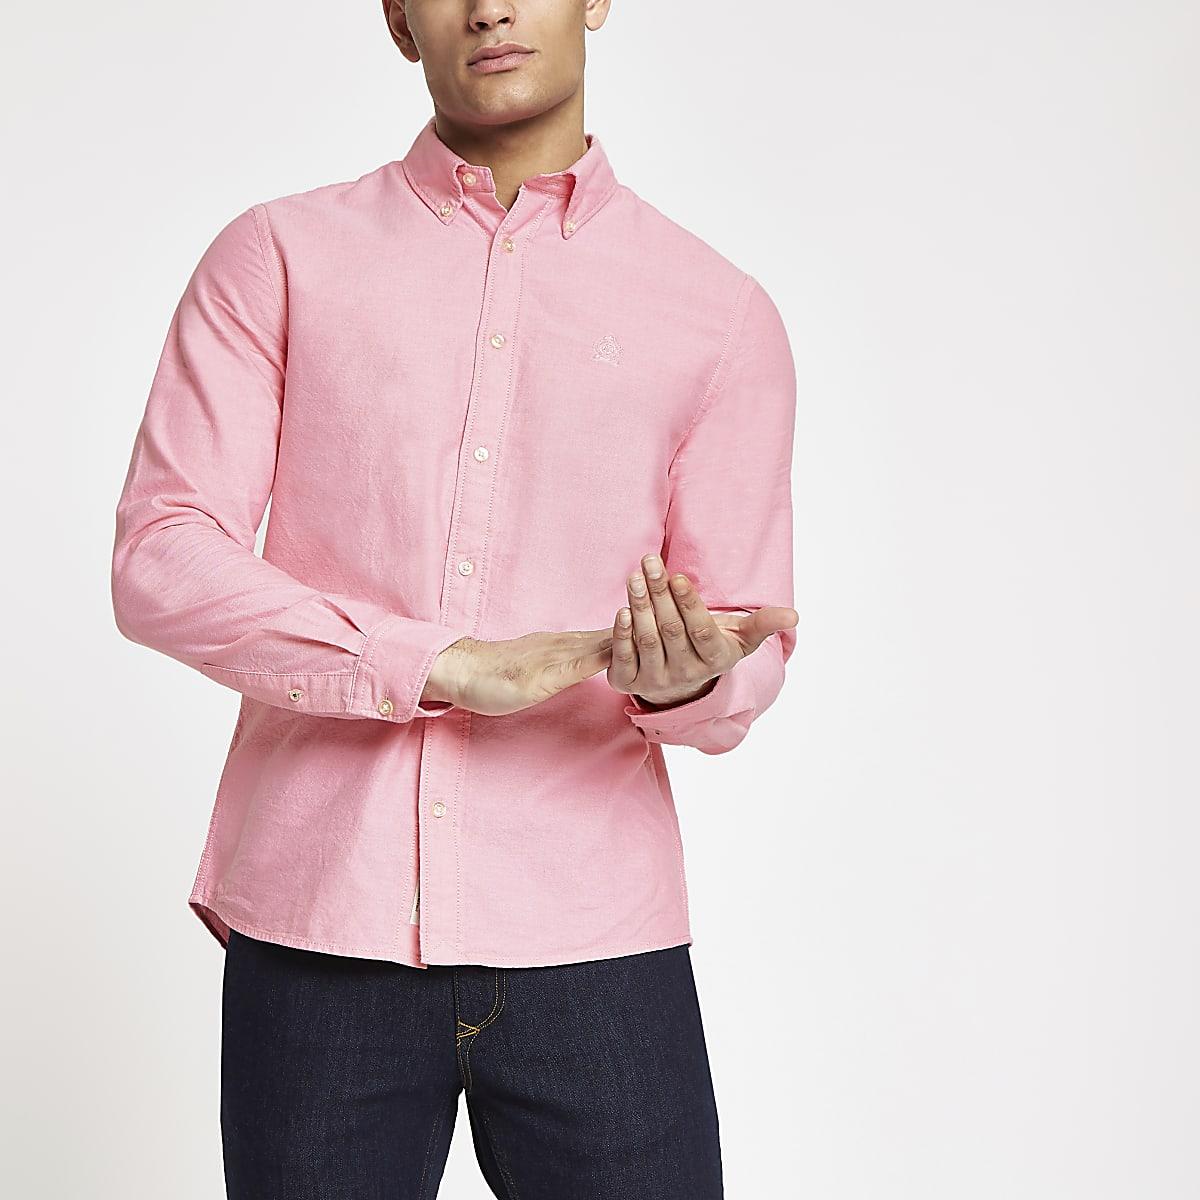 Roze Oxford overhemd met lange mouwen